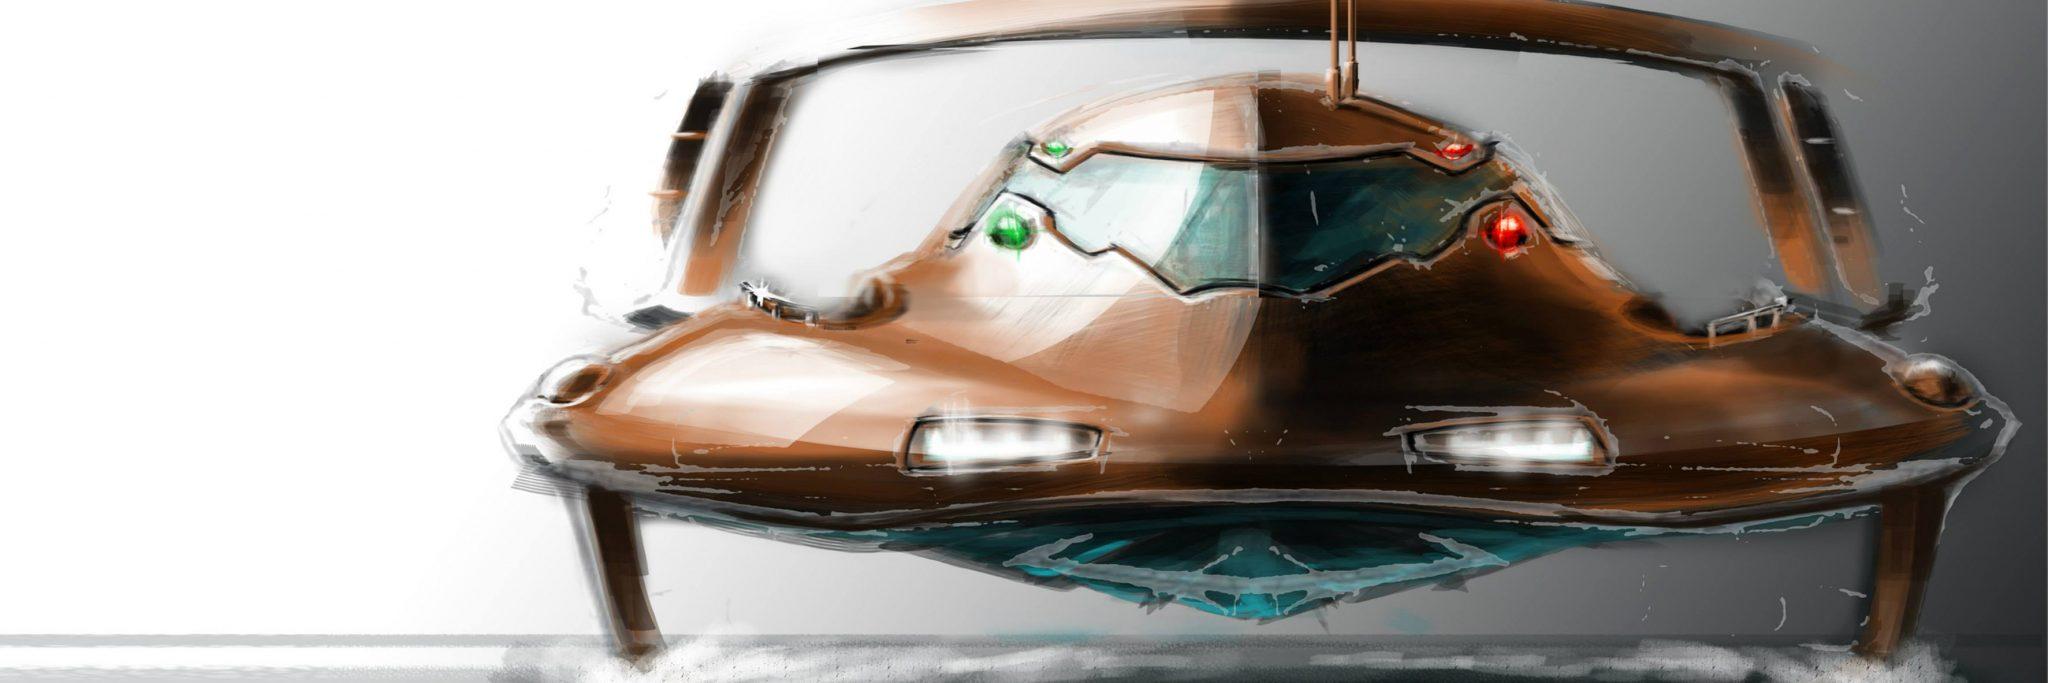 Peik Olsen hydrofoil boat